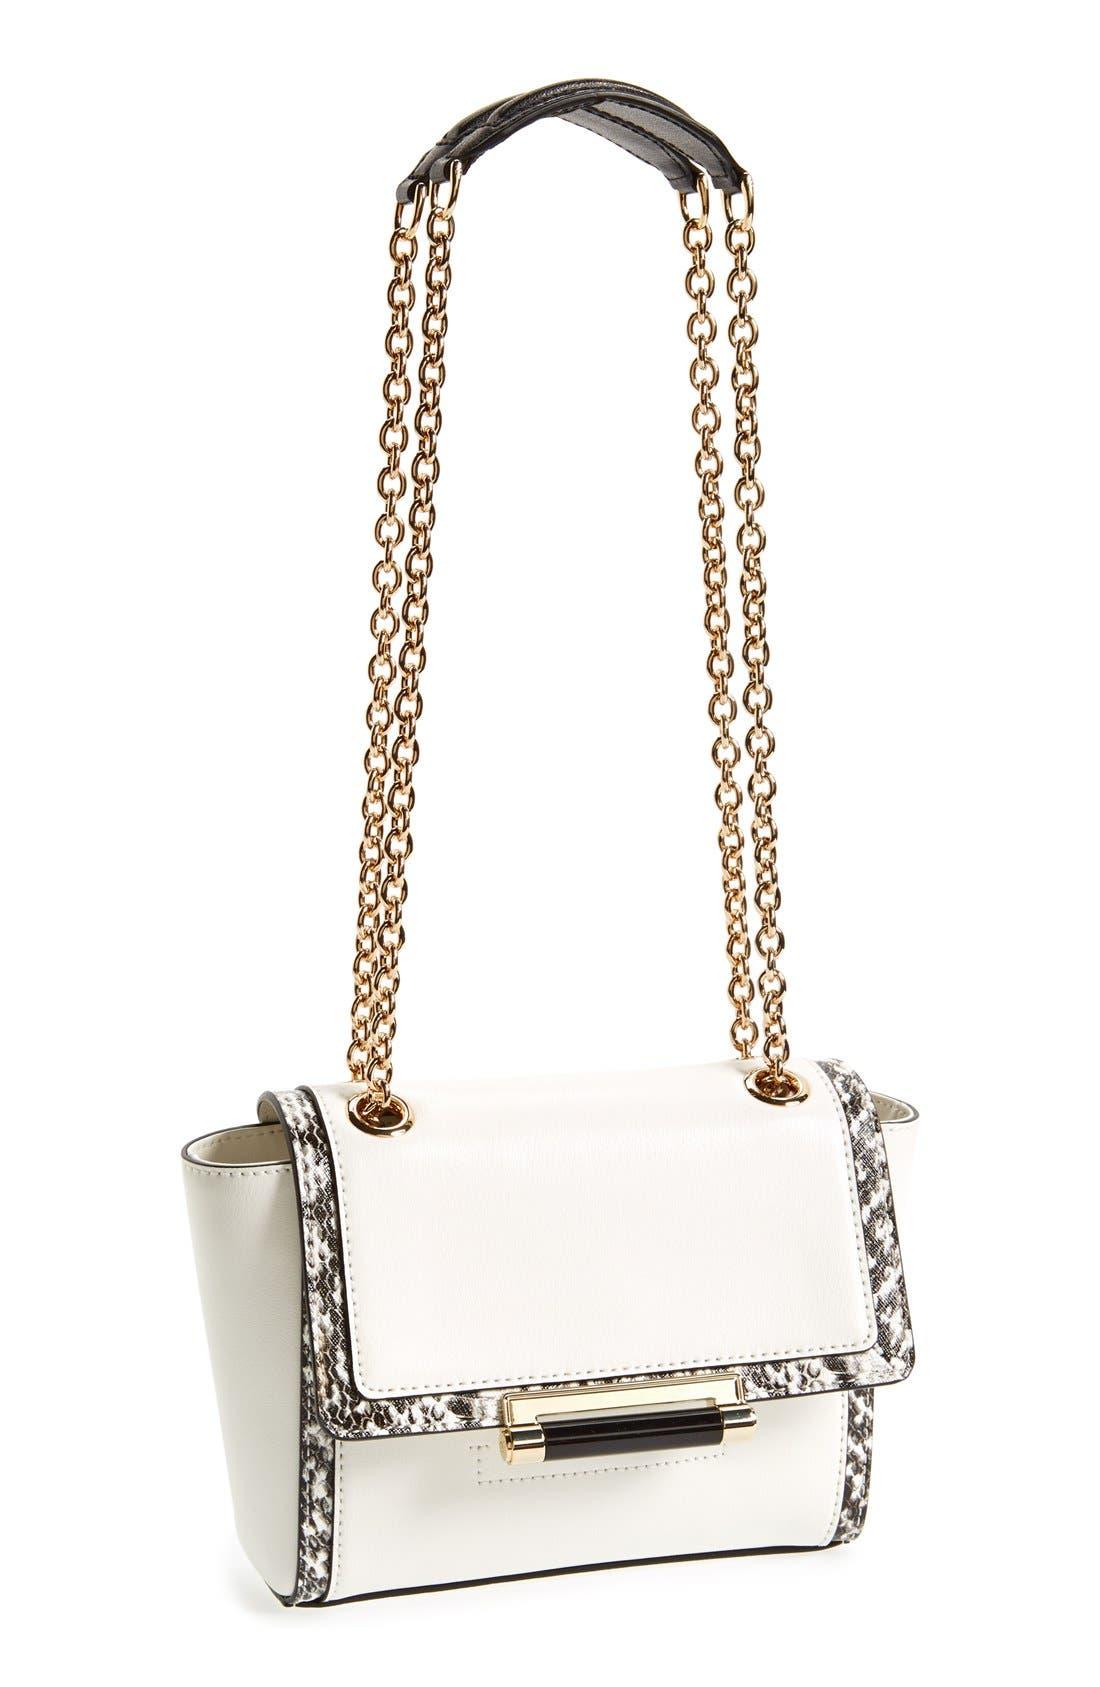 Main Image - Diane Von Furstenberg '440 - Mini' Leather Crossbody Bag